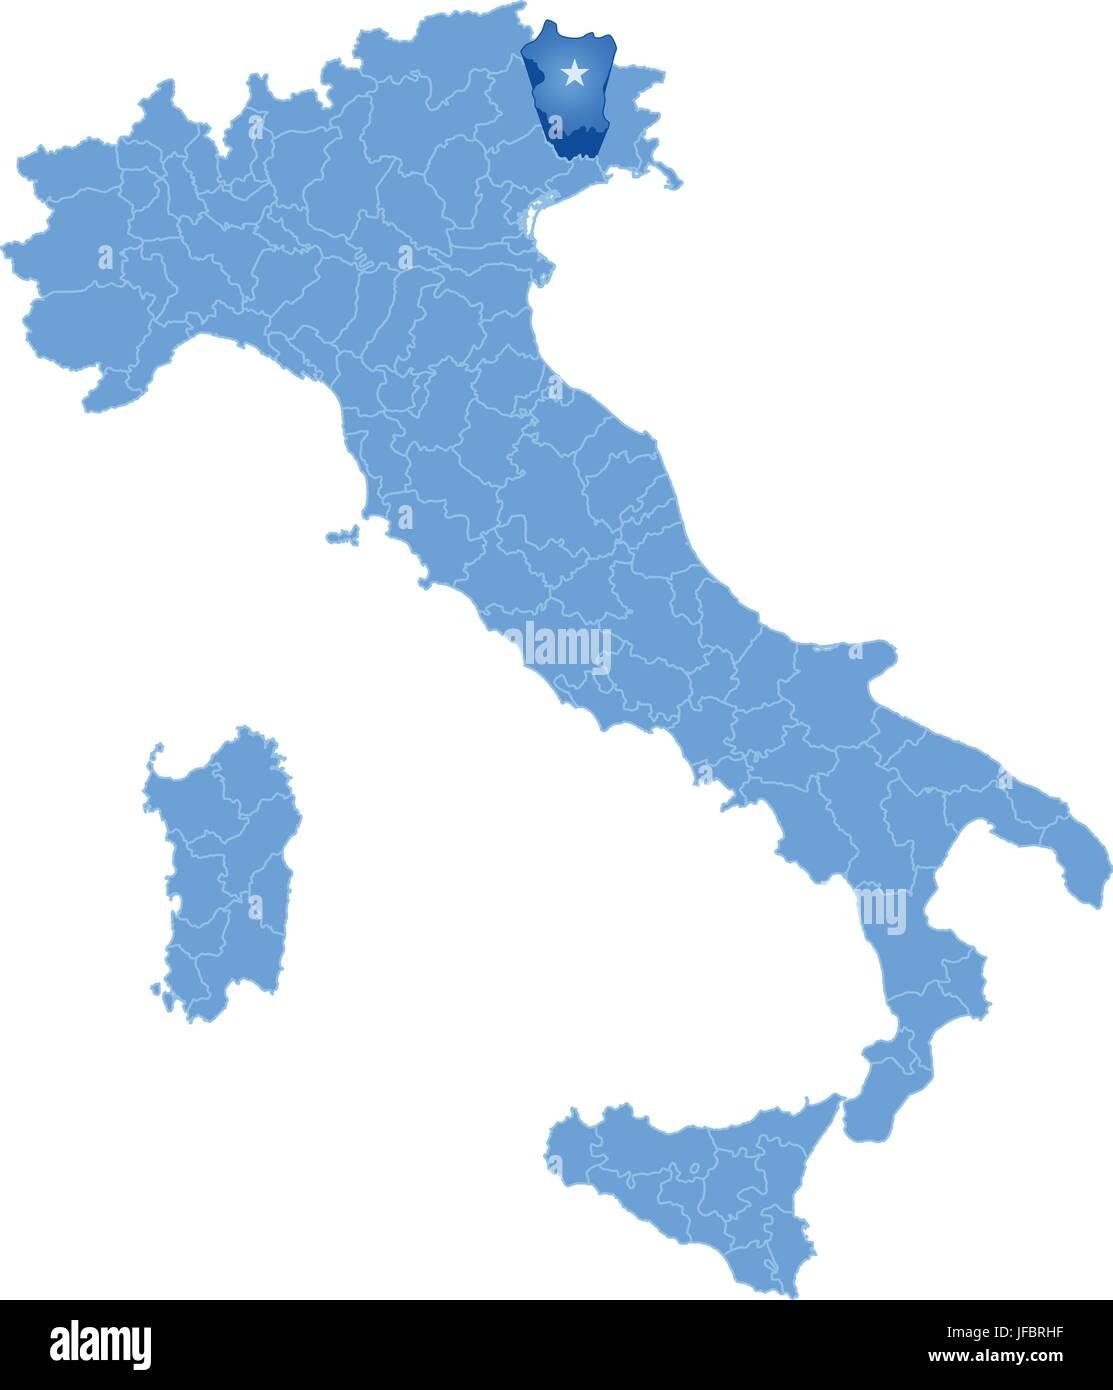 Map Of Italy Pordenone Stock Vector Art Illustration Vector